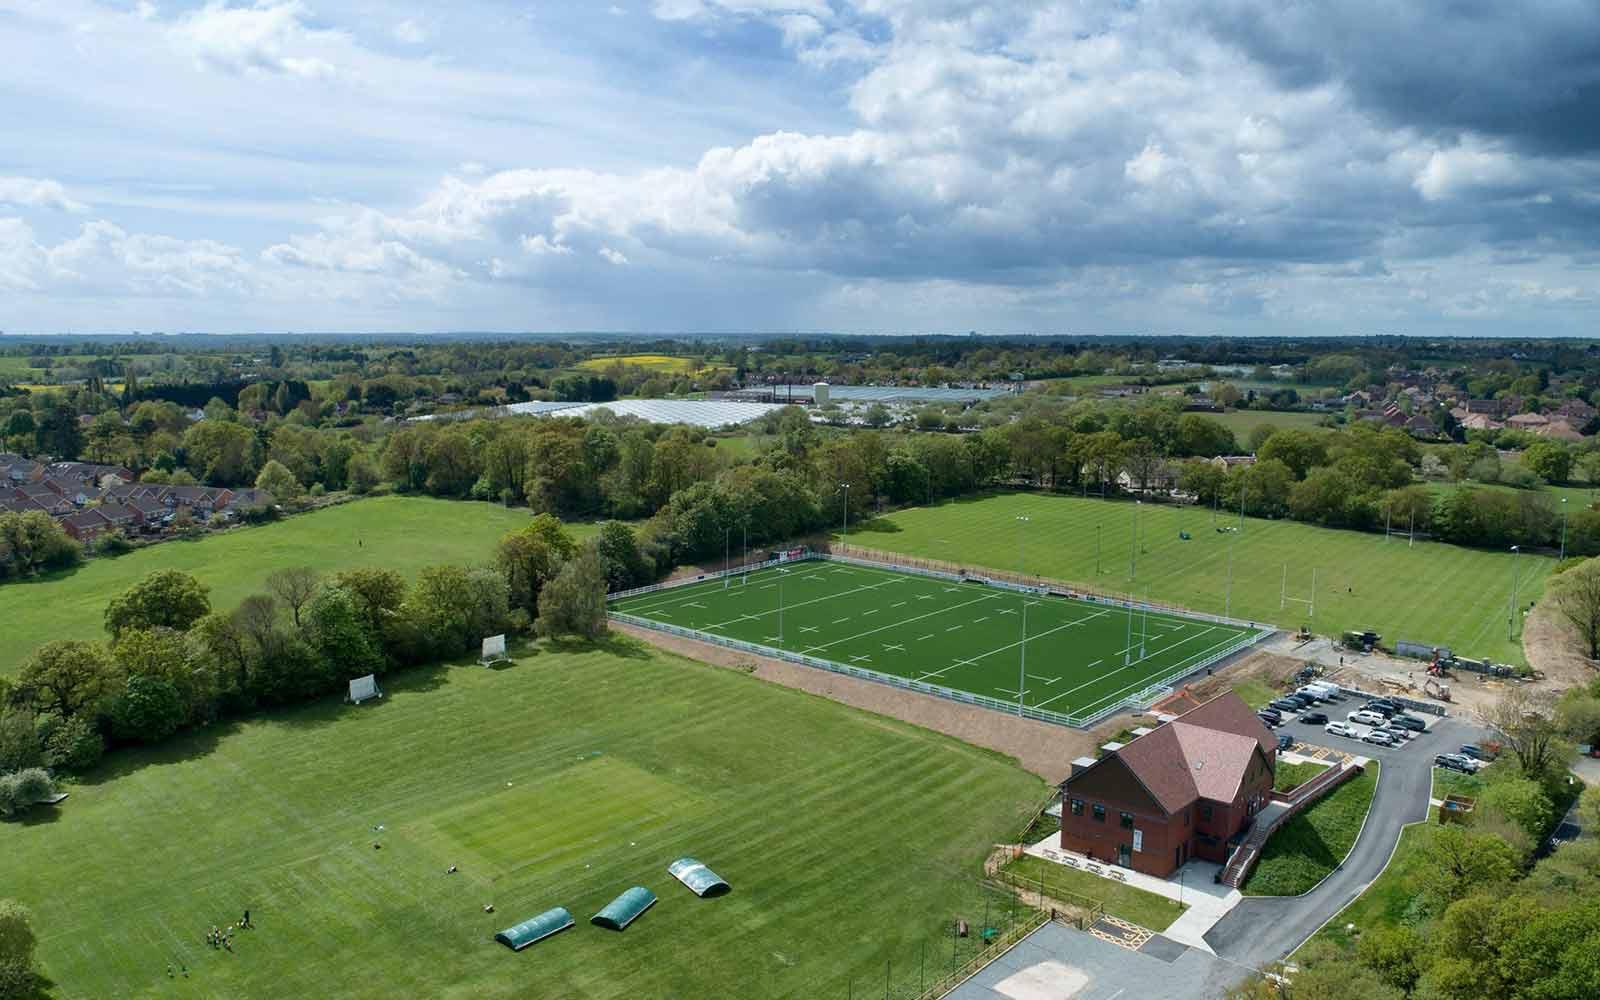 Rosedale Sports Club facilities